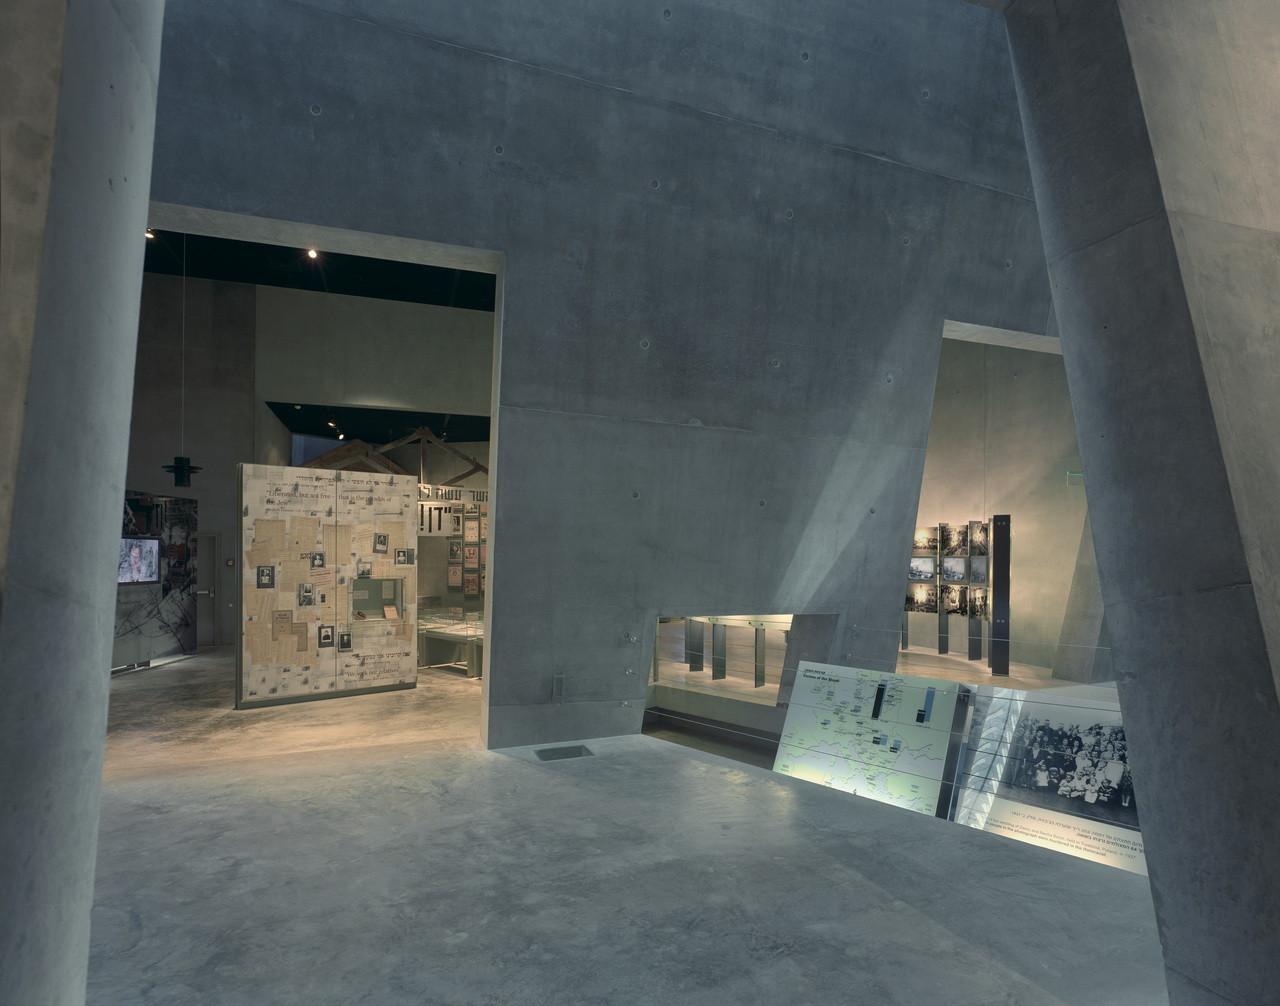 Gallery Of Flashback Yad Vashem Holocaust Museum Safdie